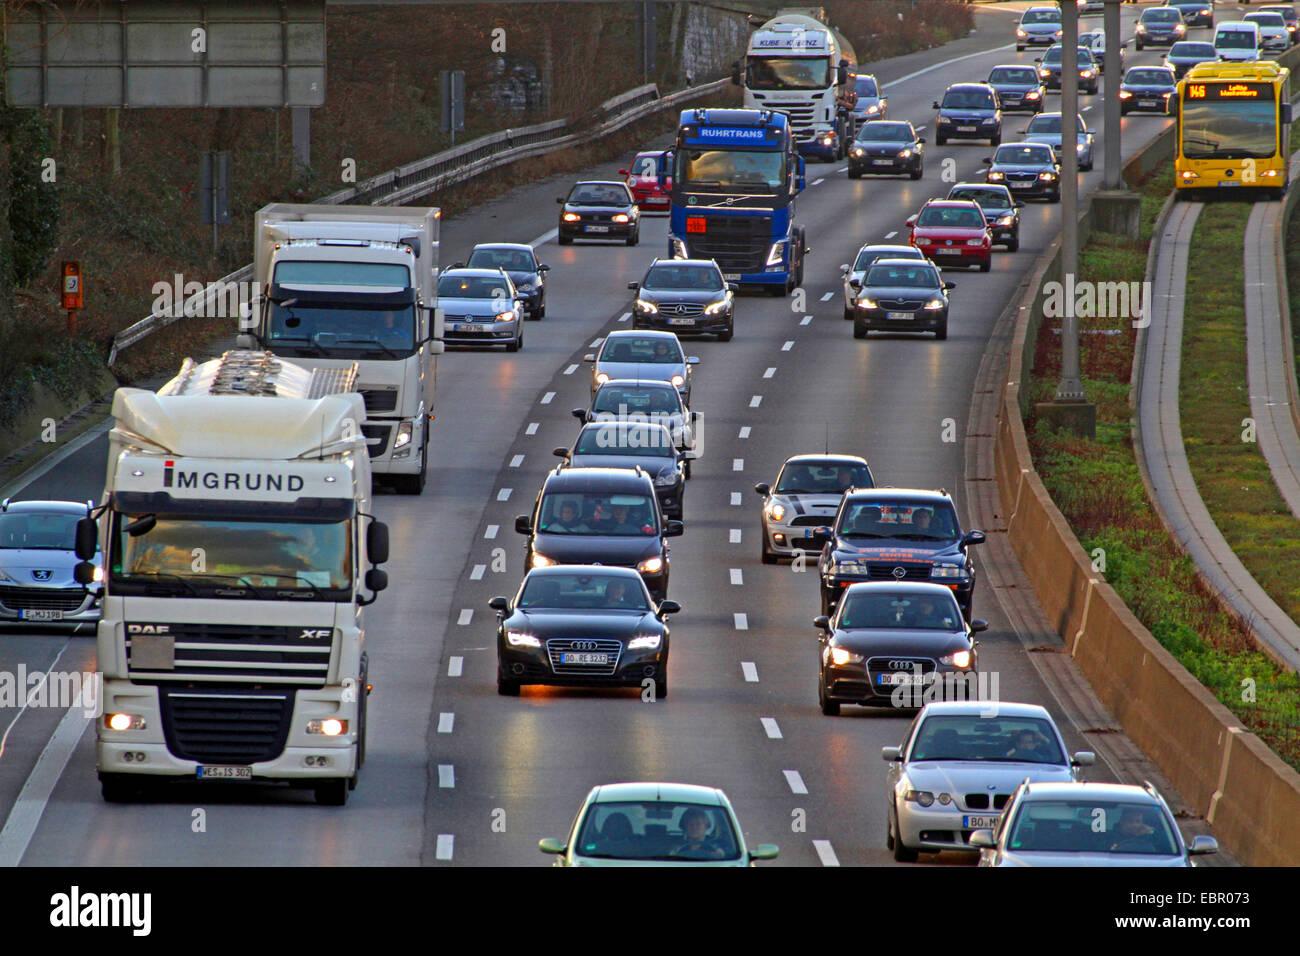 traffic density on motorway A40, Germany, North Rhine-Westphalia, Ruhr Area, Essen - Stock Image